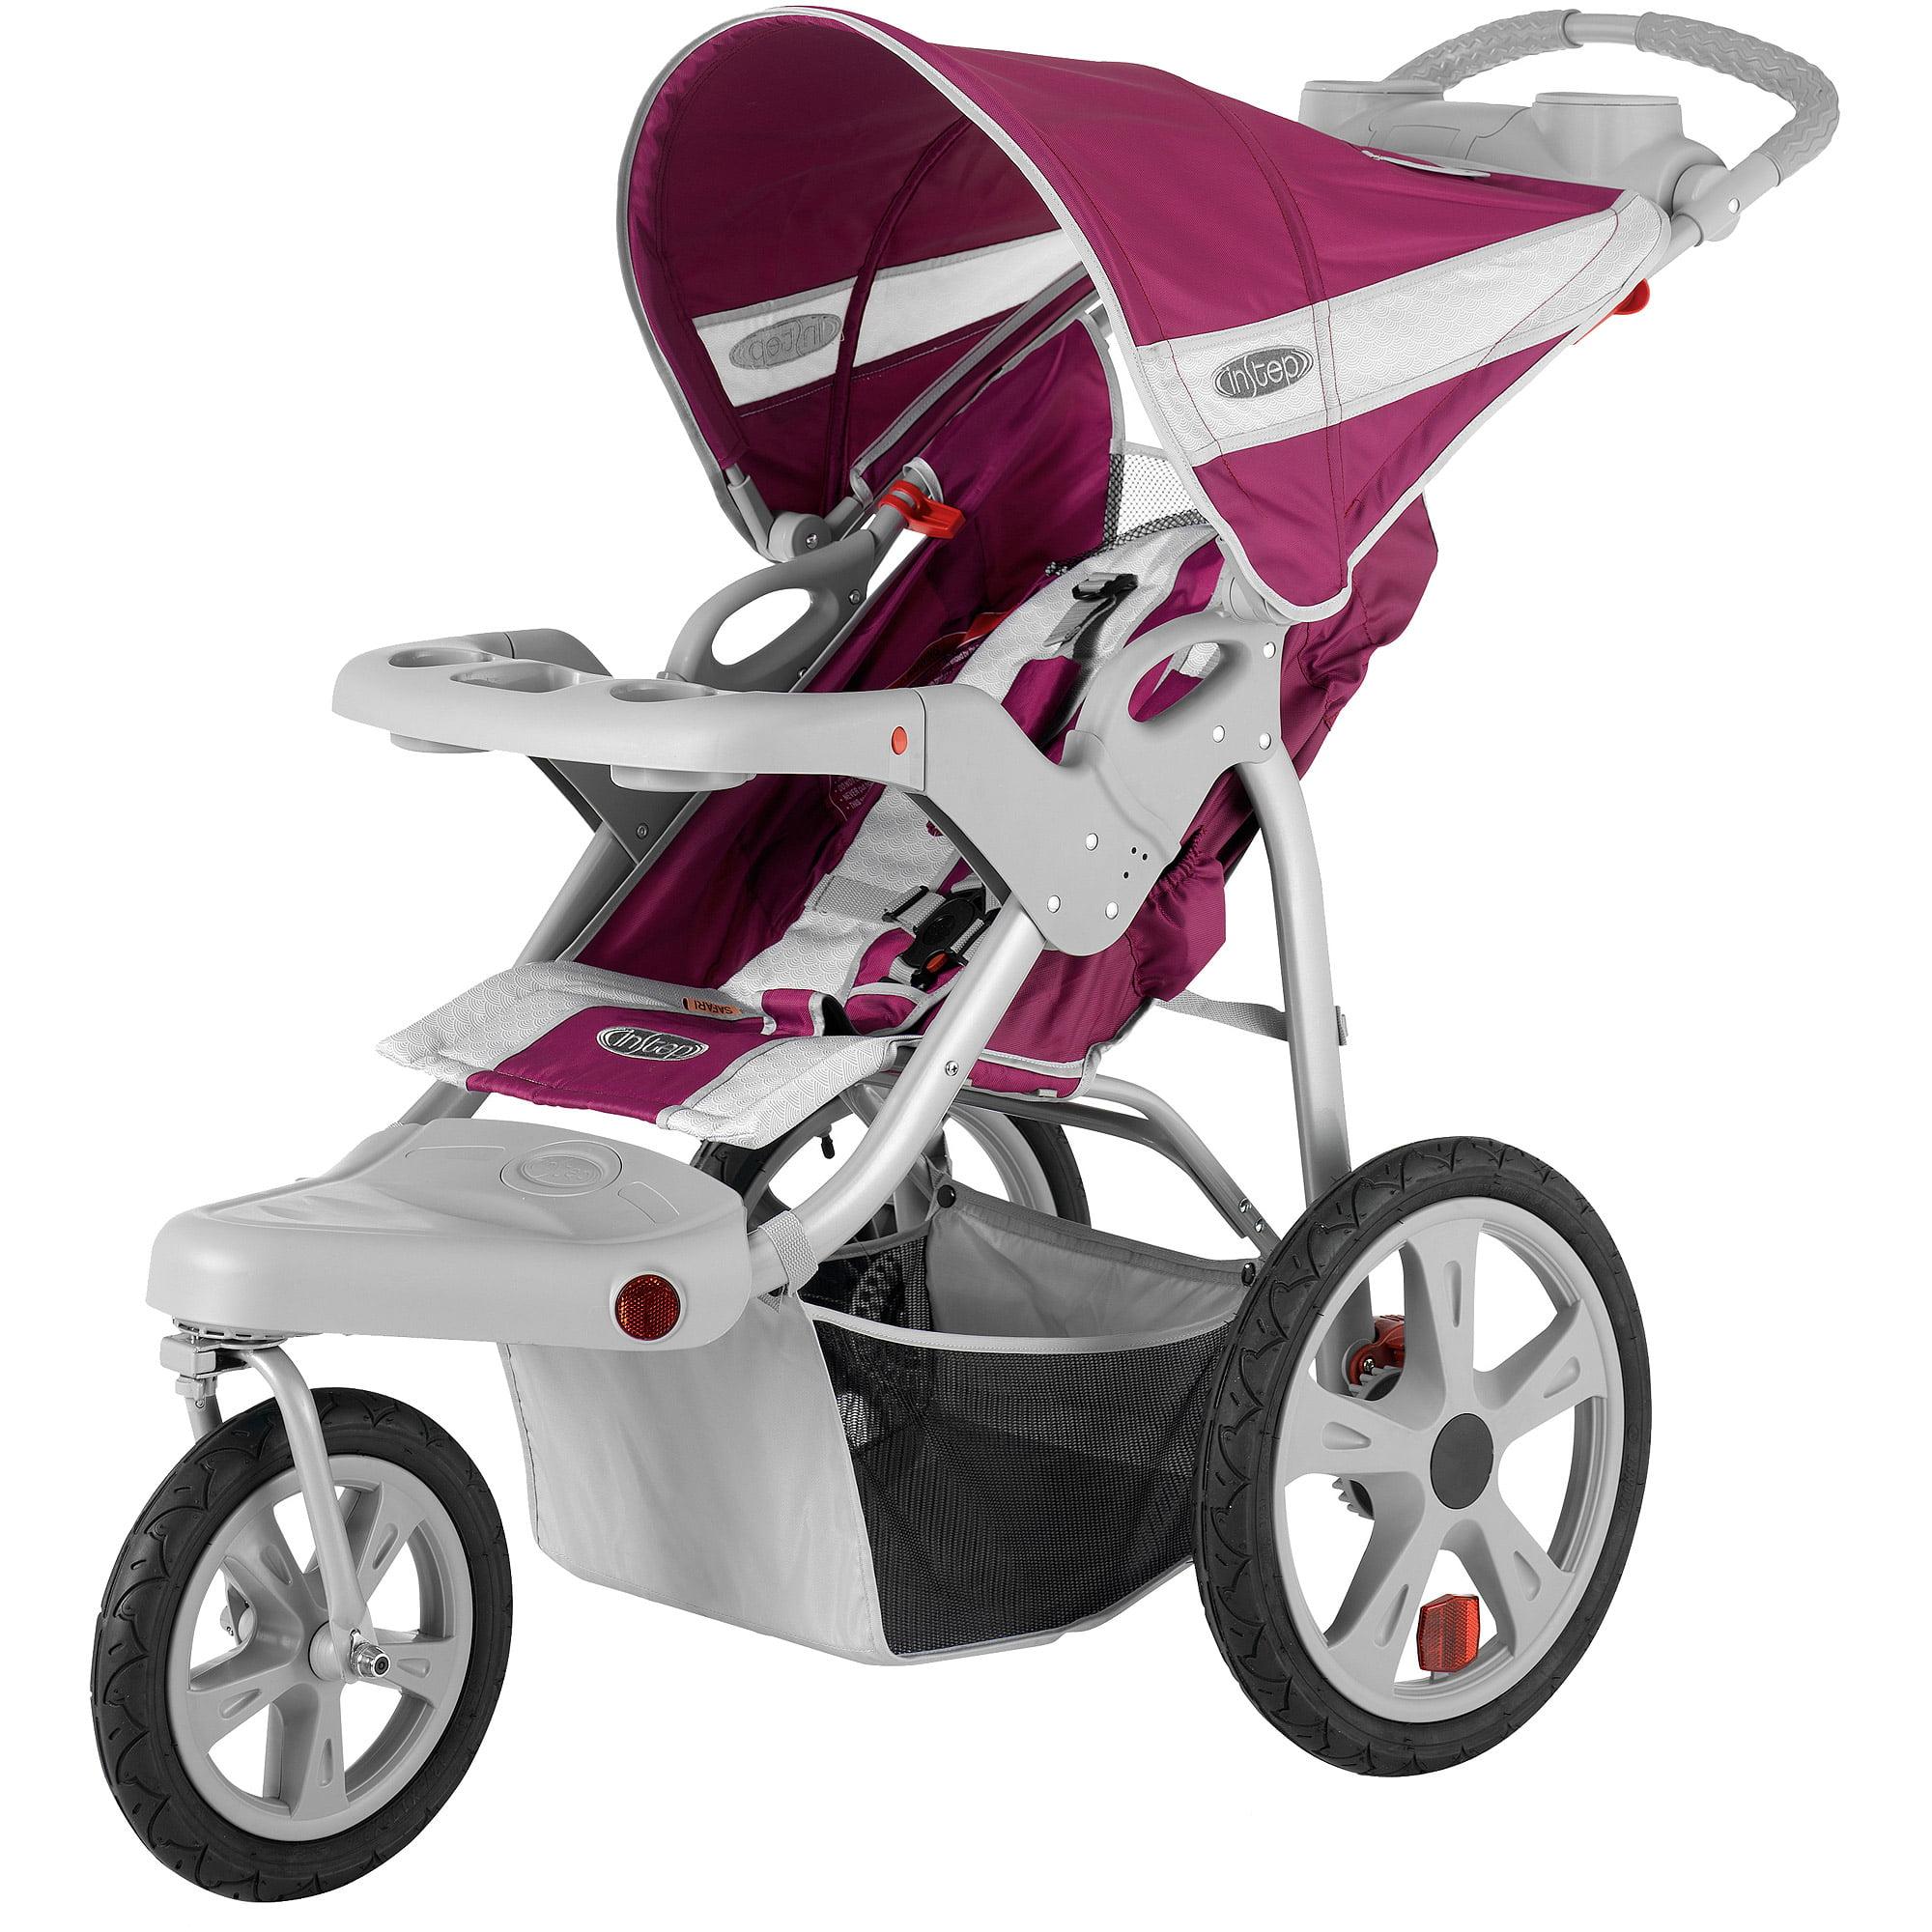 InStep Safari Single Jogging Stroller - Walmart.com